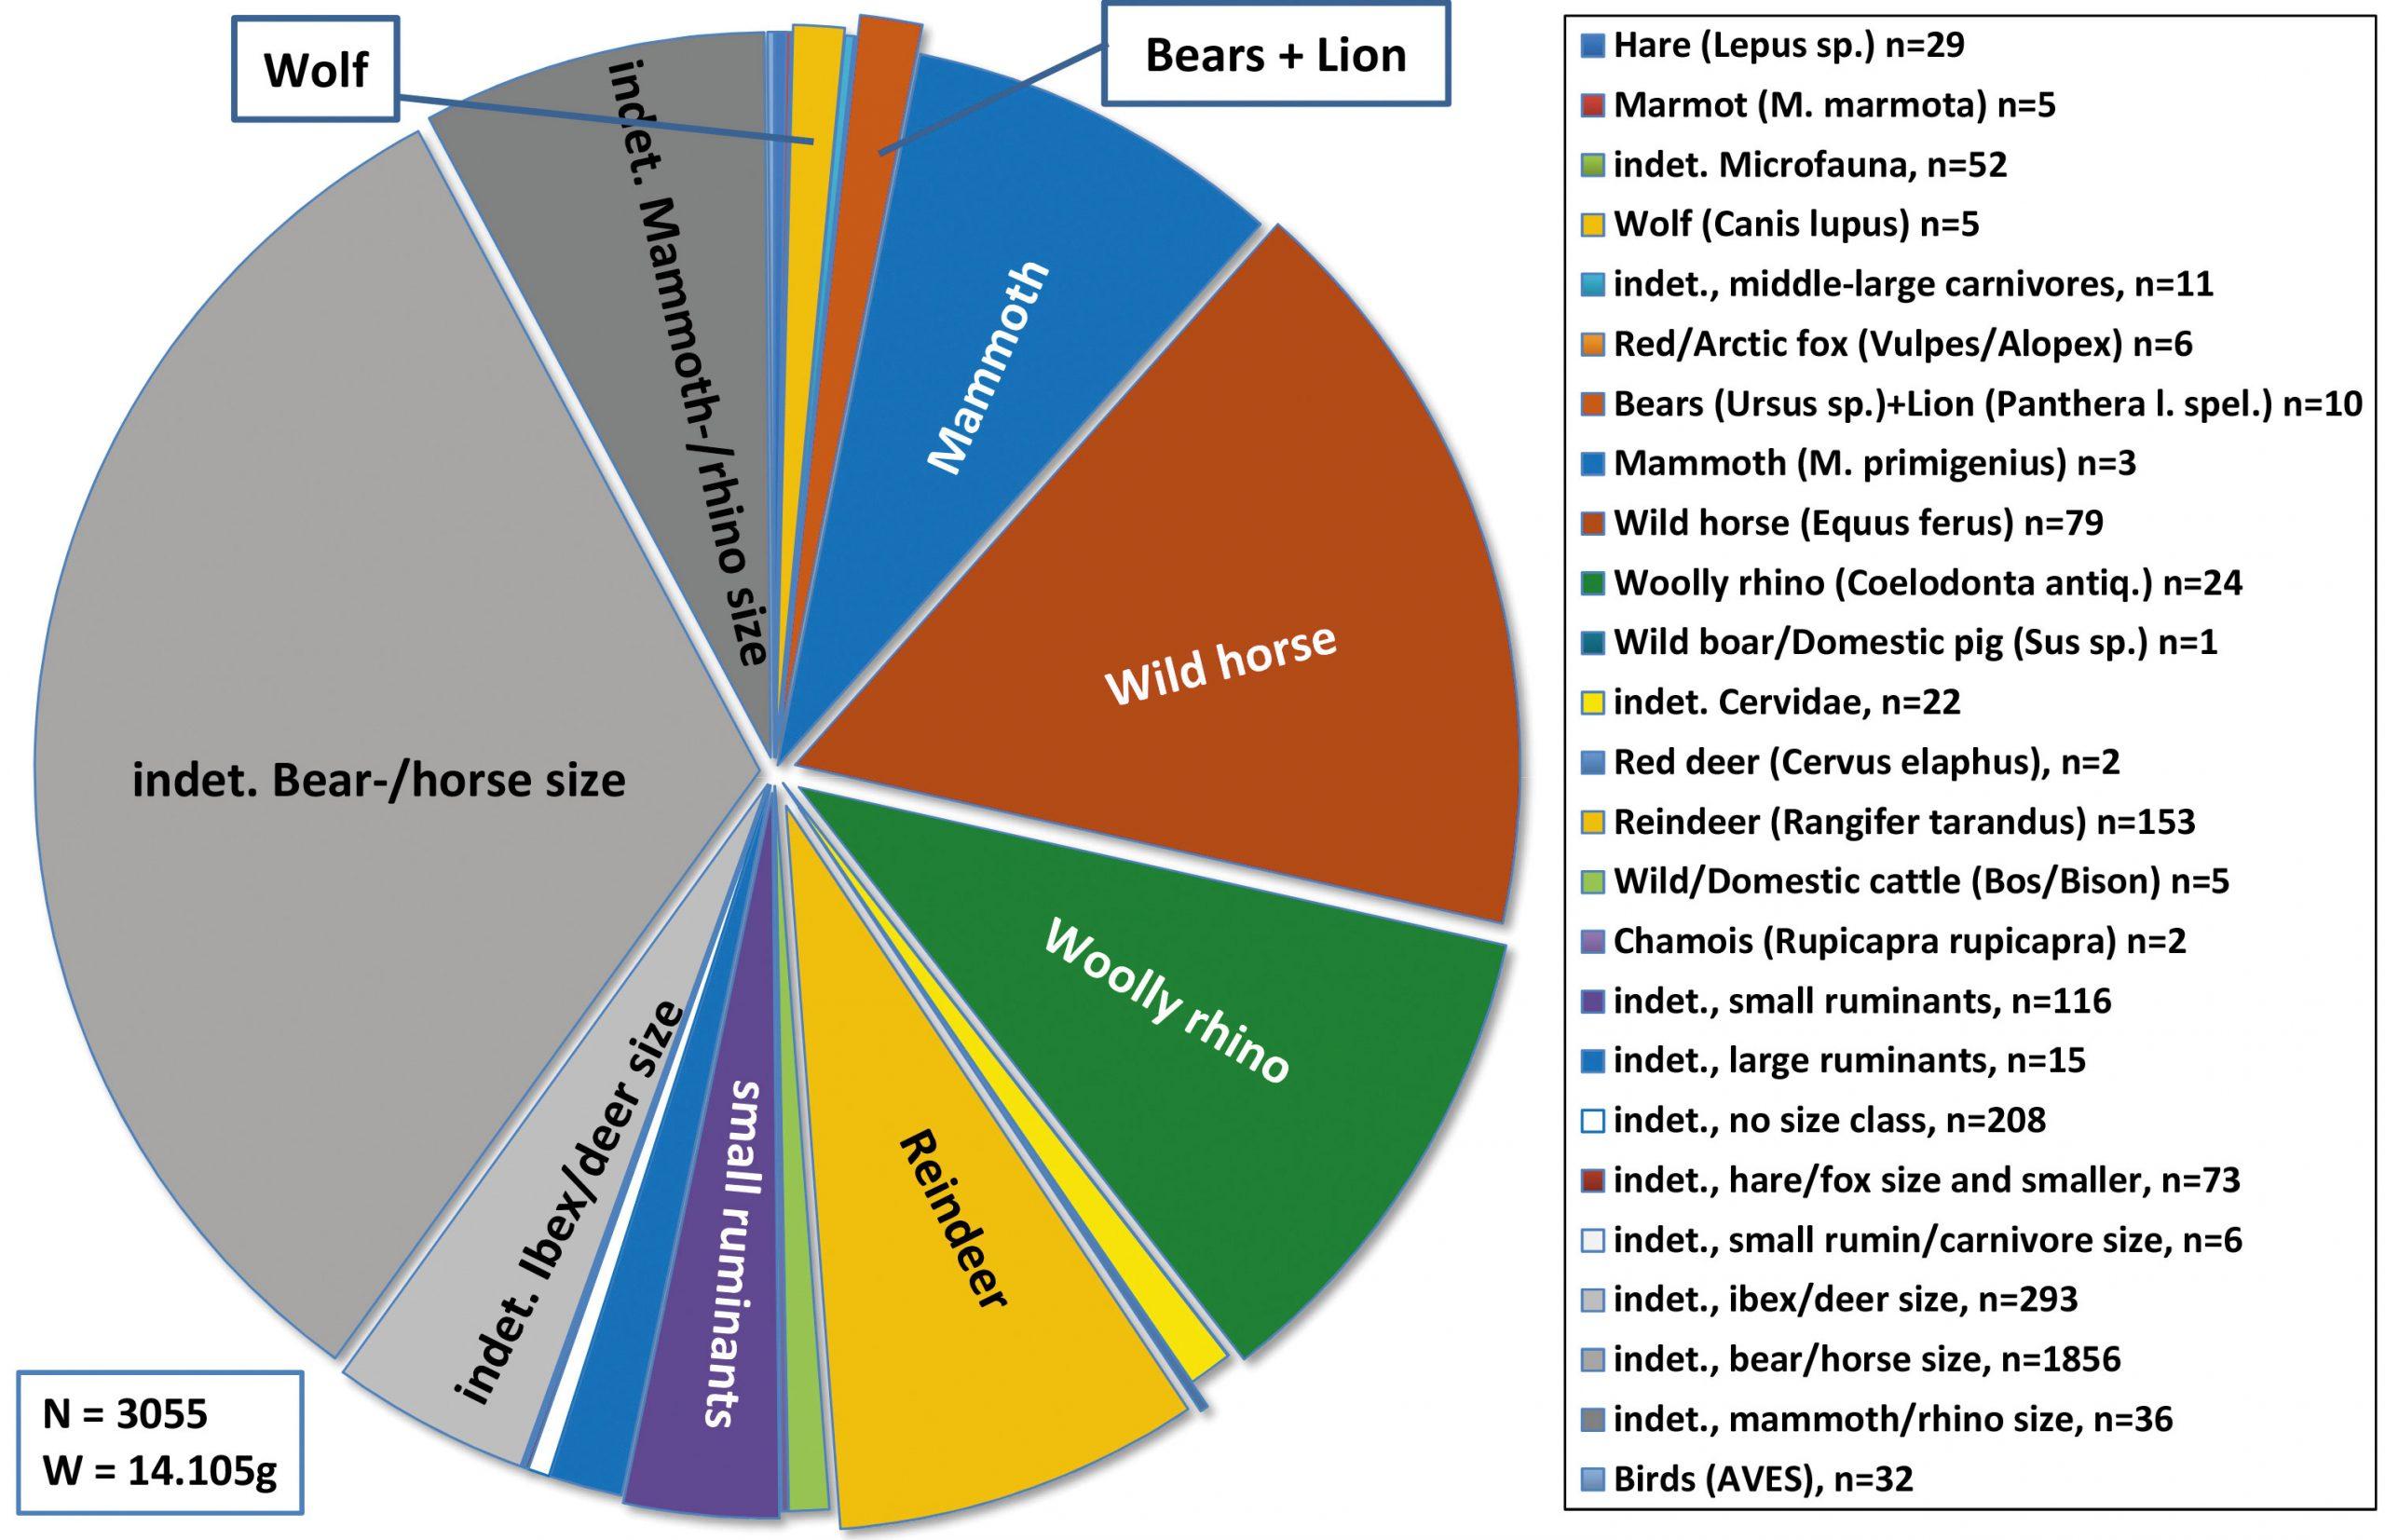 Pie chart of fauna by bone weight